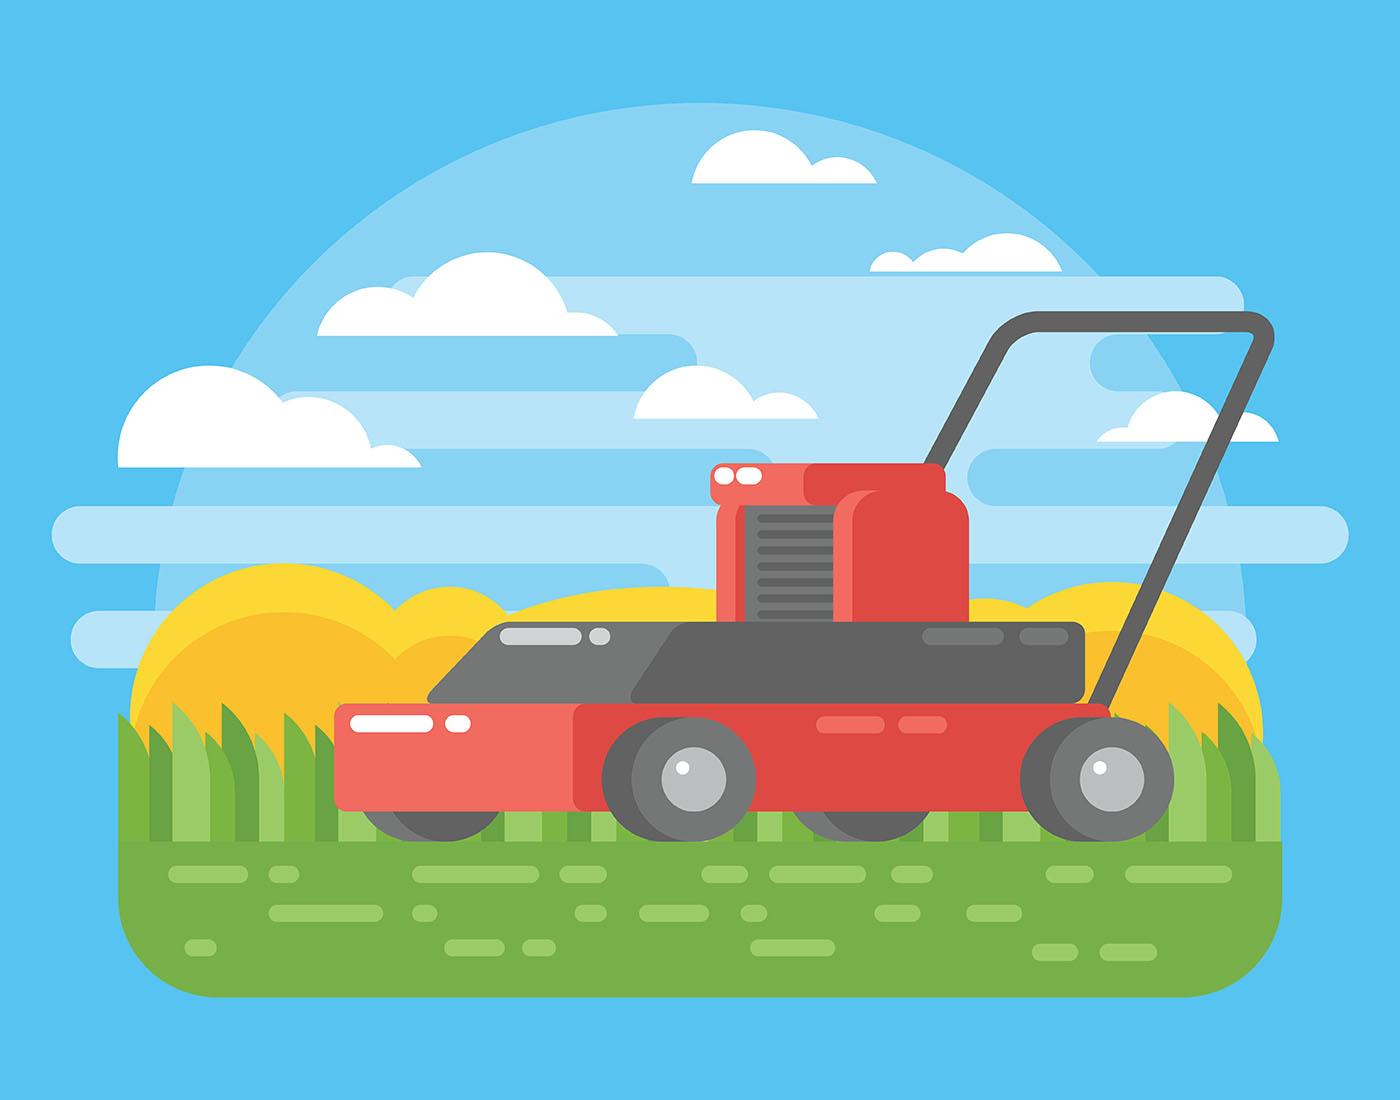 Lawn Mower Illustration Download Free Vectors Clipart